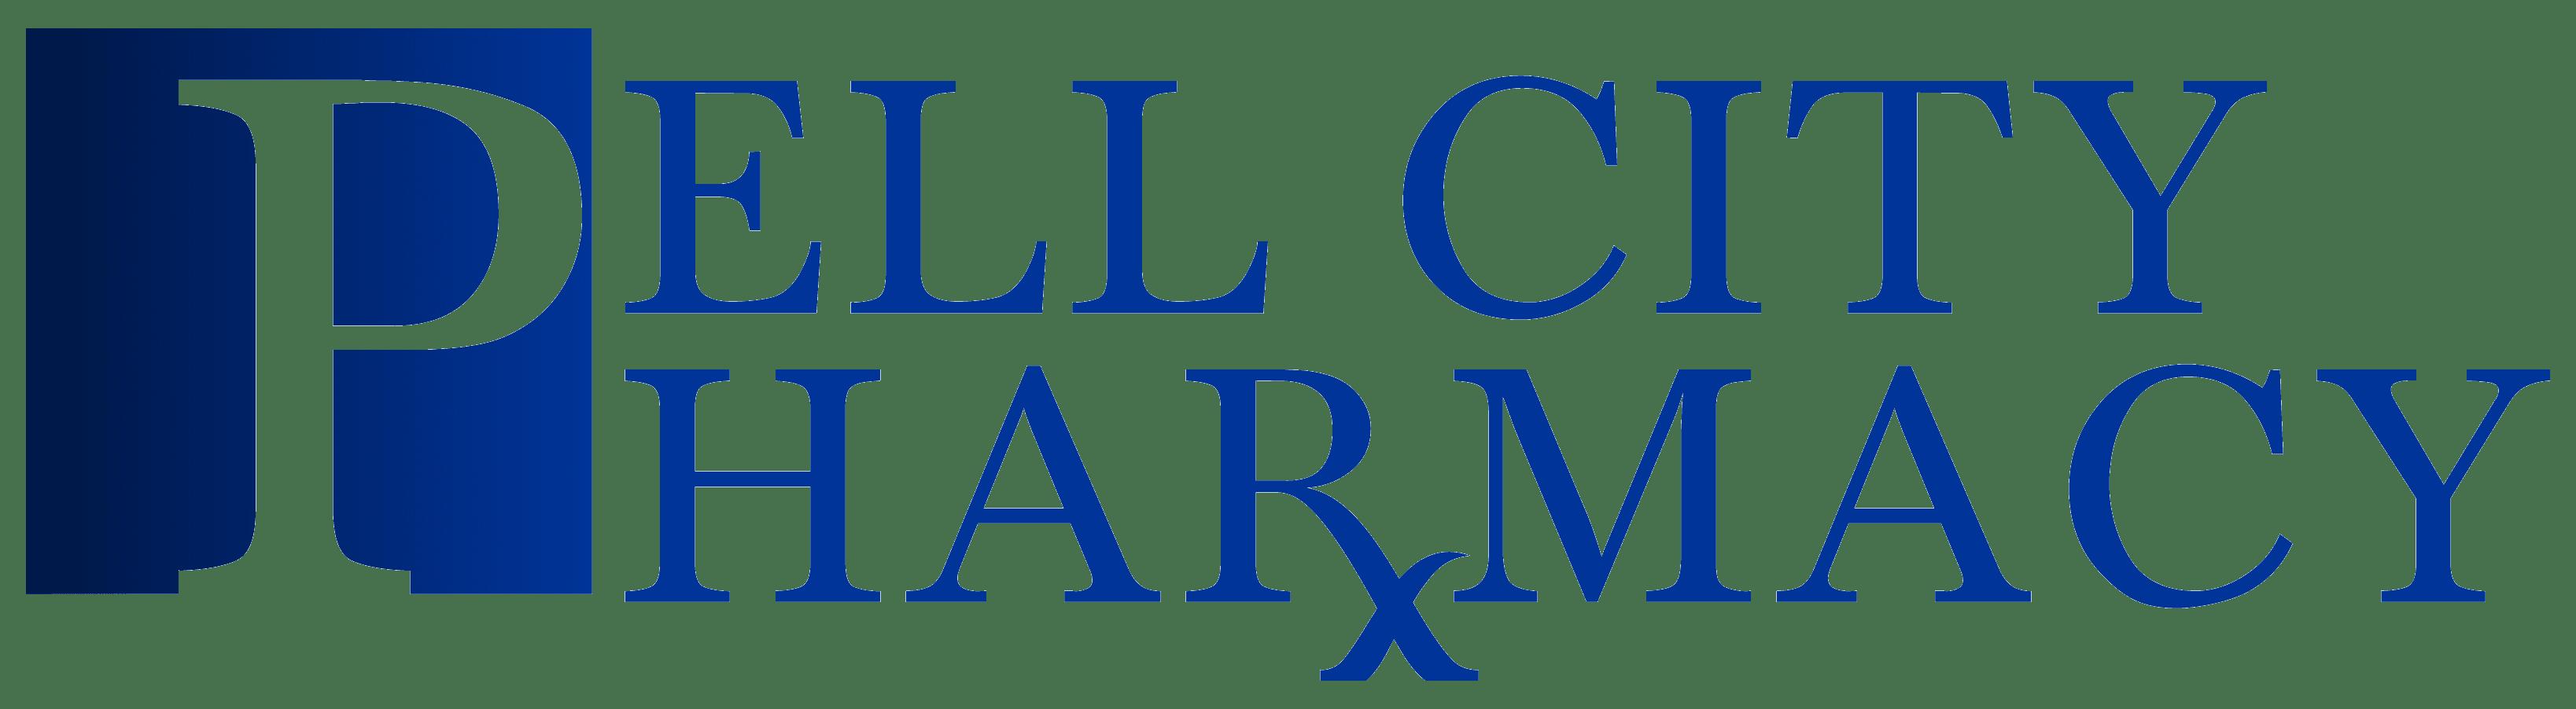 Health News - Pell City Pharmacy | Locally Owned Pharmacy